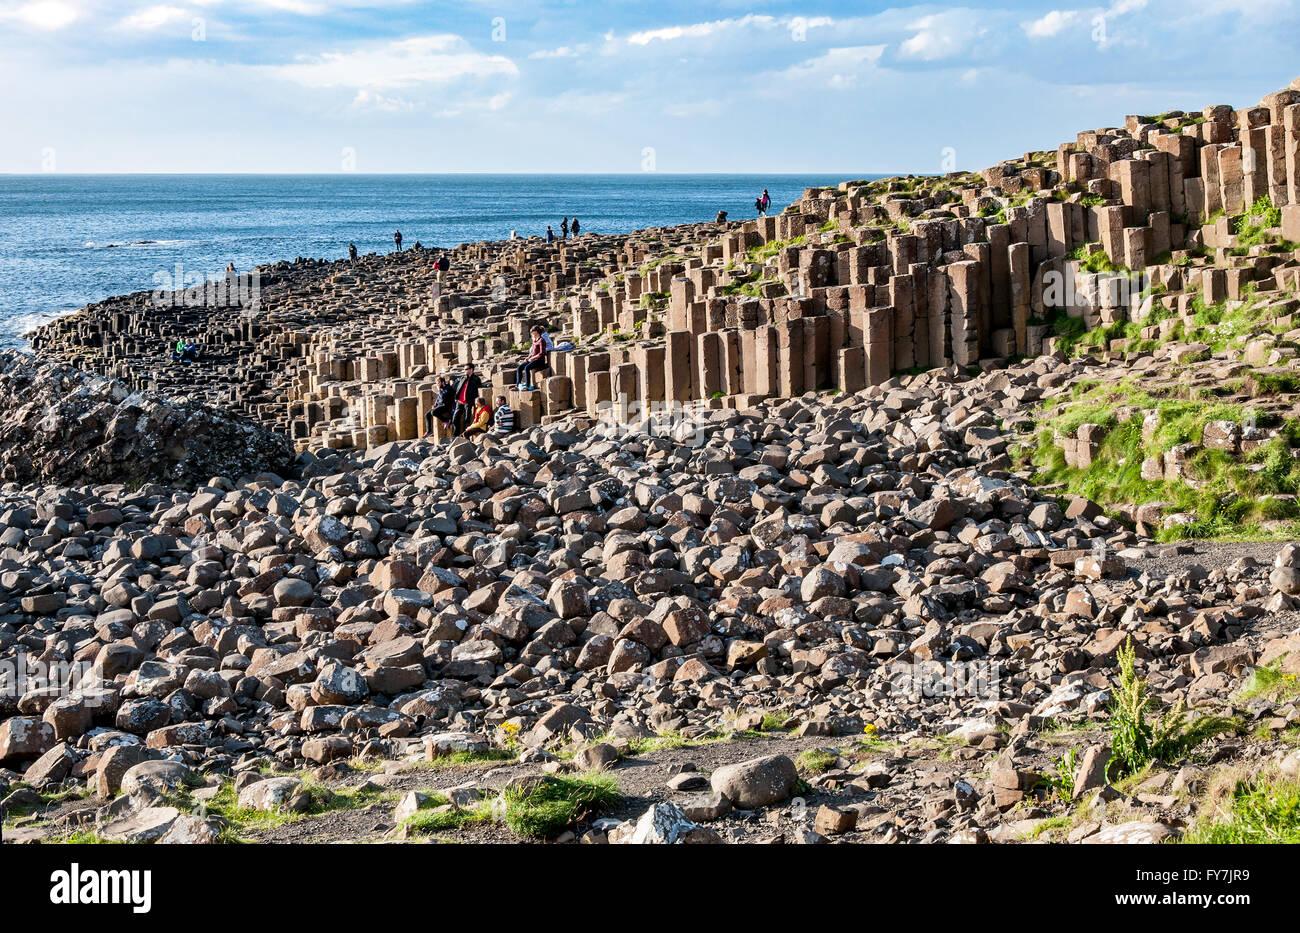 Giants Causeway. Tourists visiting unique geological hexagonal formations of volcanic basalt rocks on Atlantic coast - Stock Image